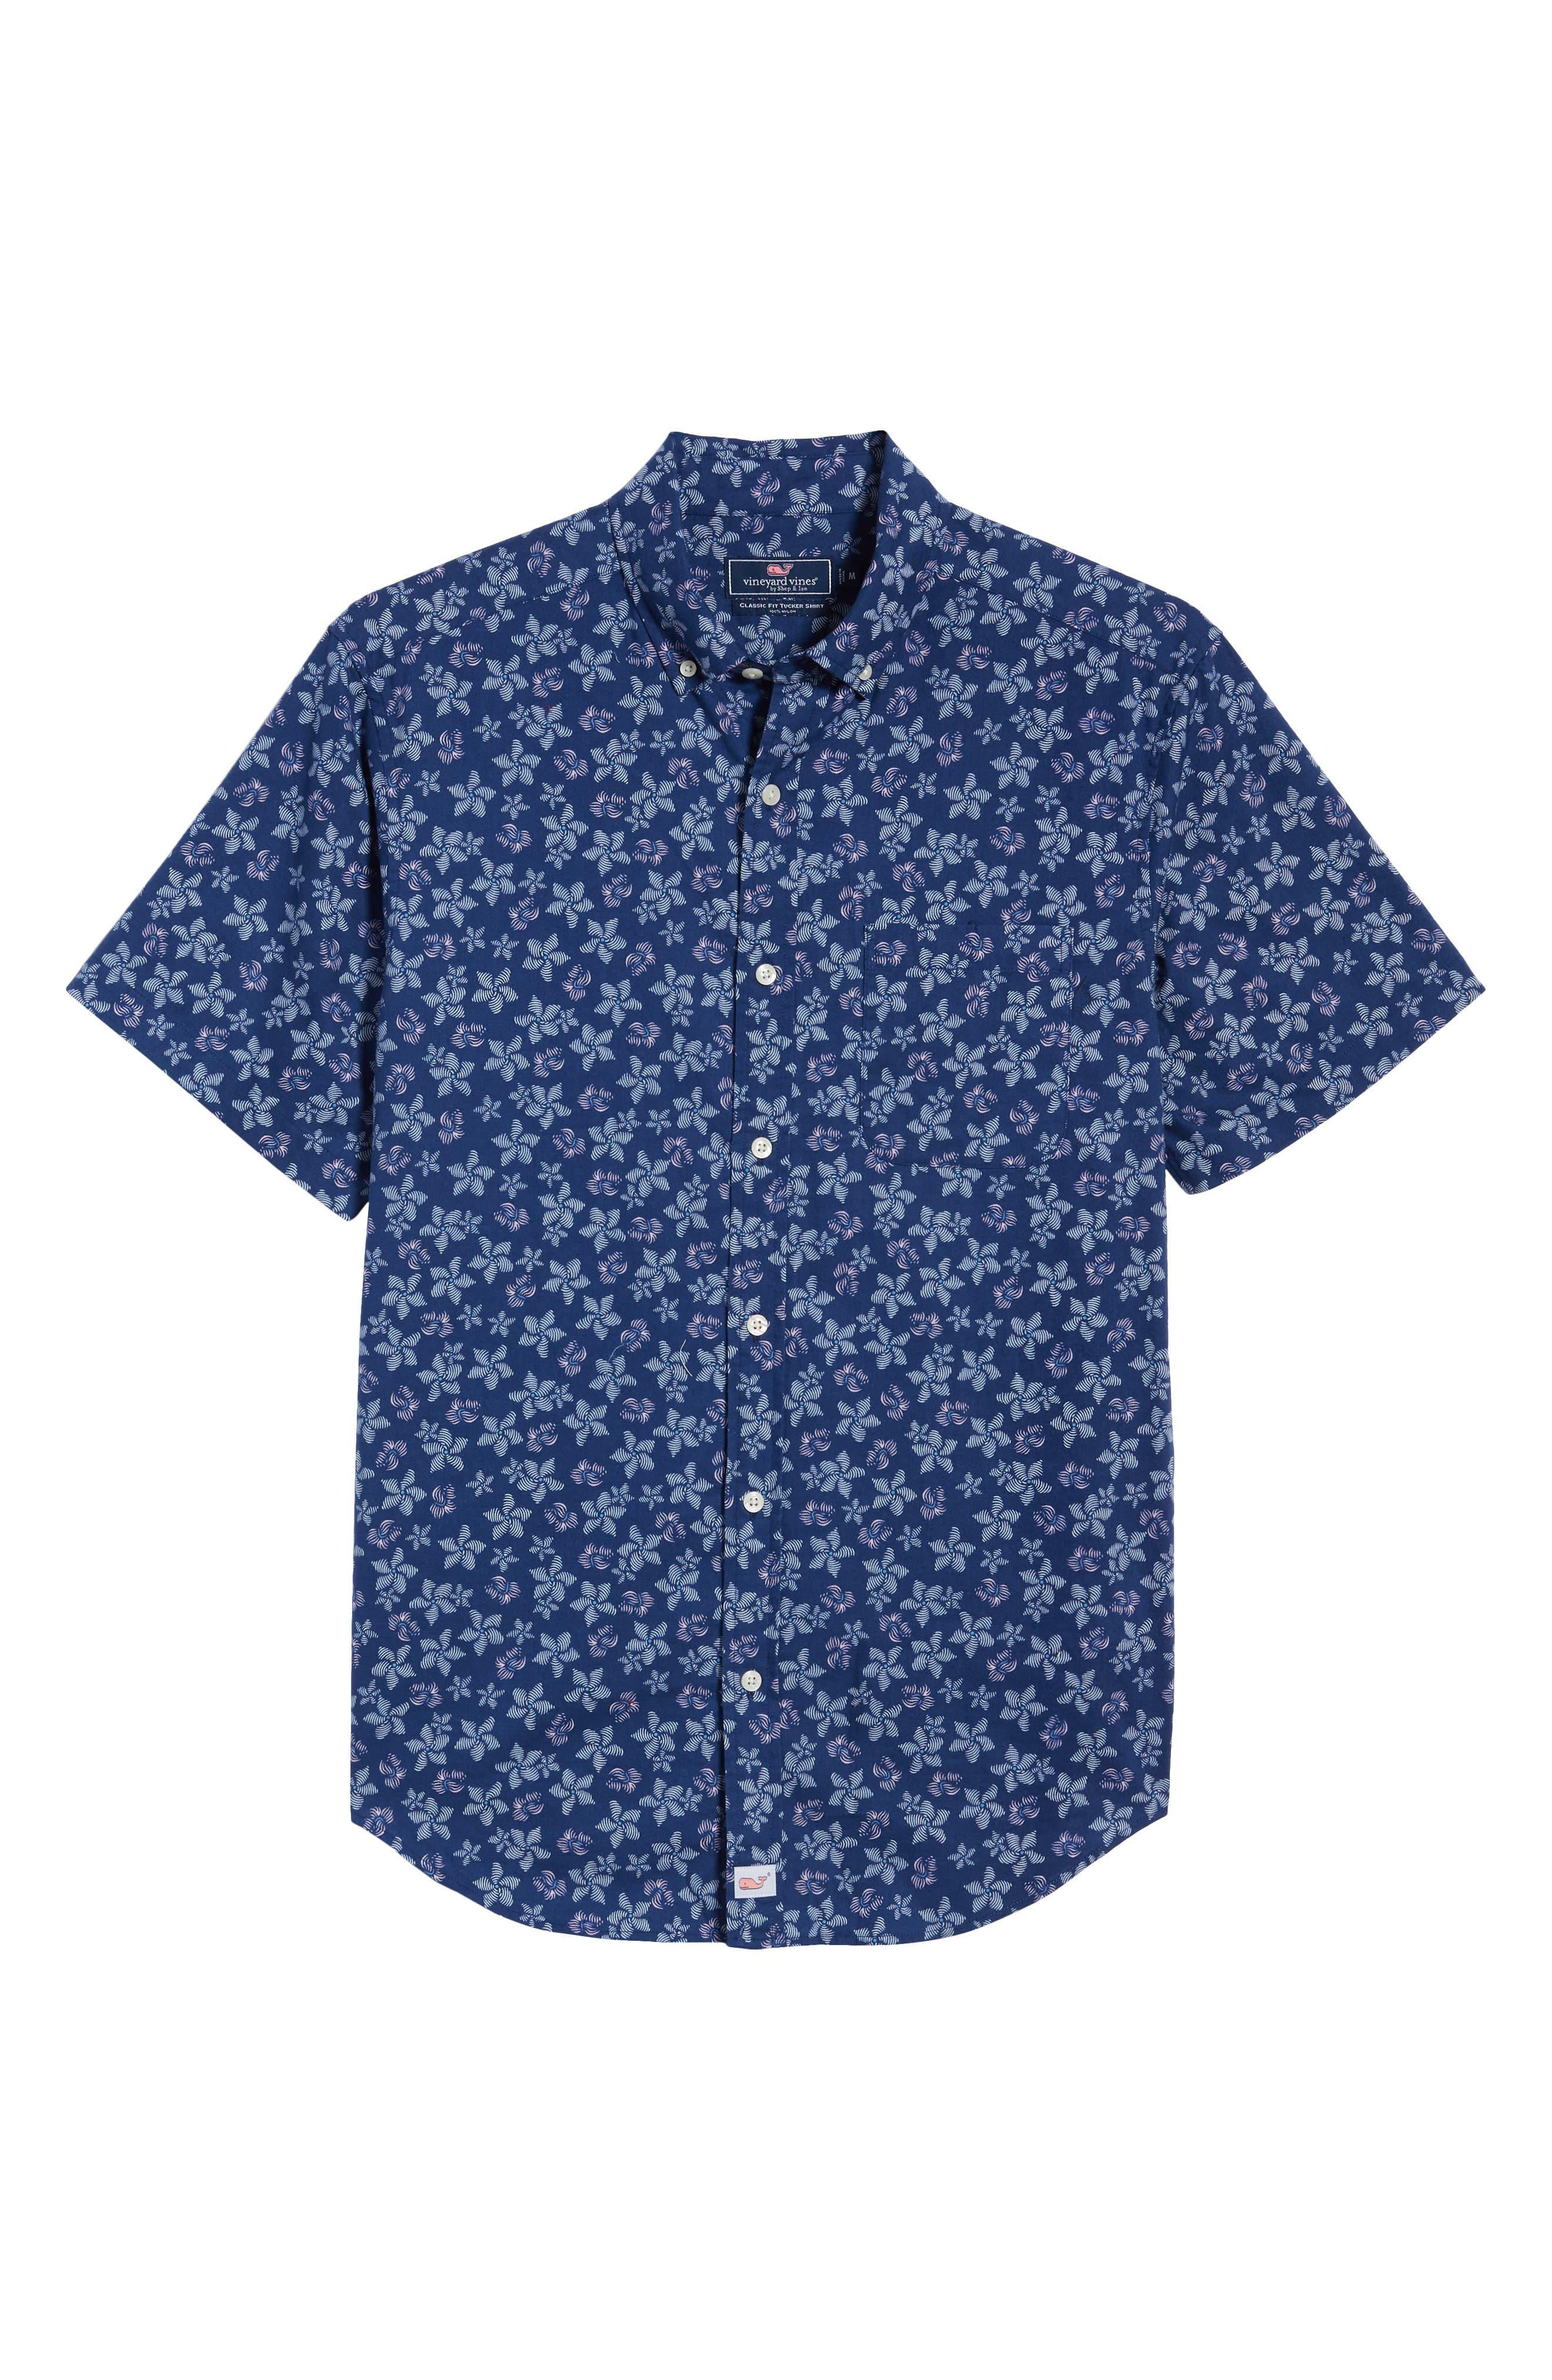 VINEYARD VINES, Murray Slim Fit Floral Print Sport Shirt, Alternate thumbnail 5, color, DEEP BAY